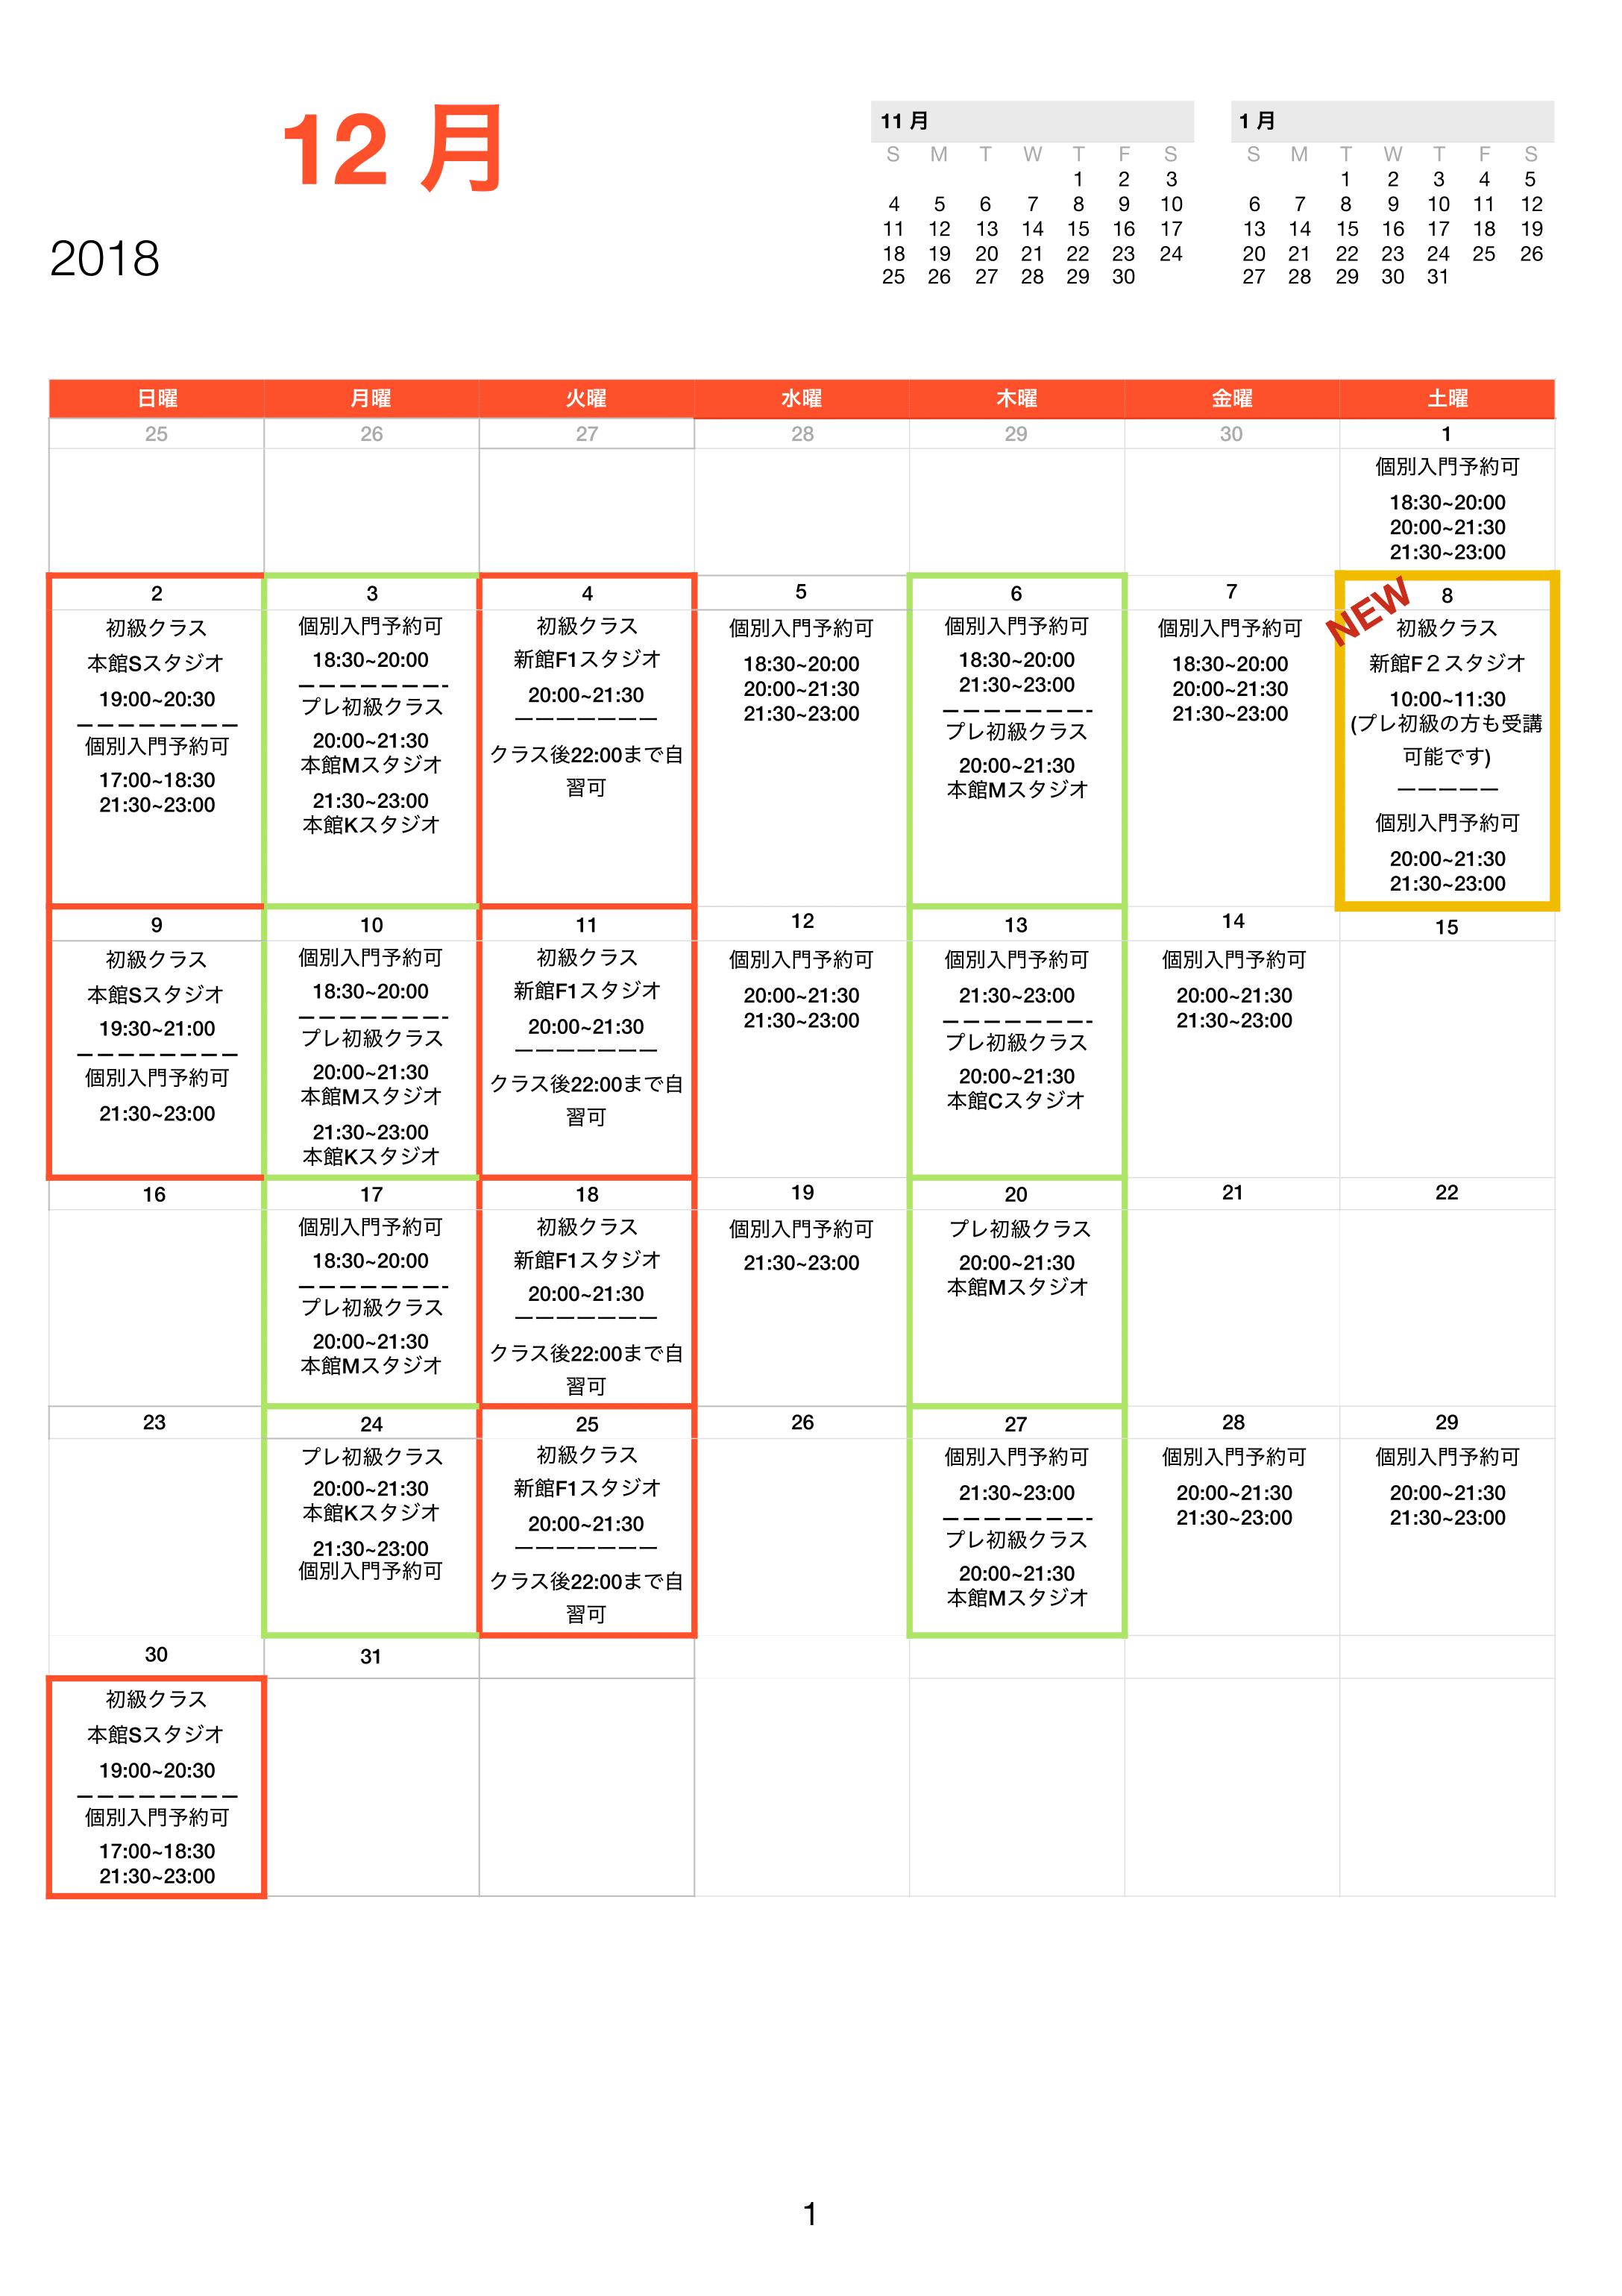 BFMsch201812ver3-1